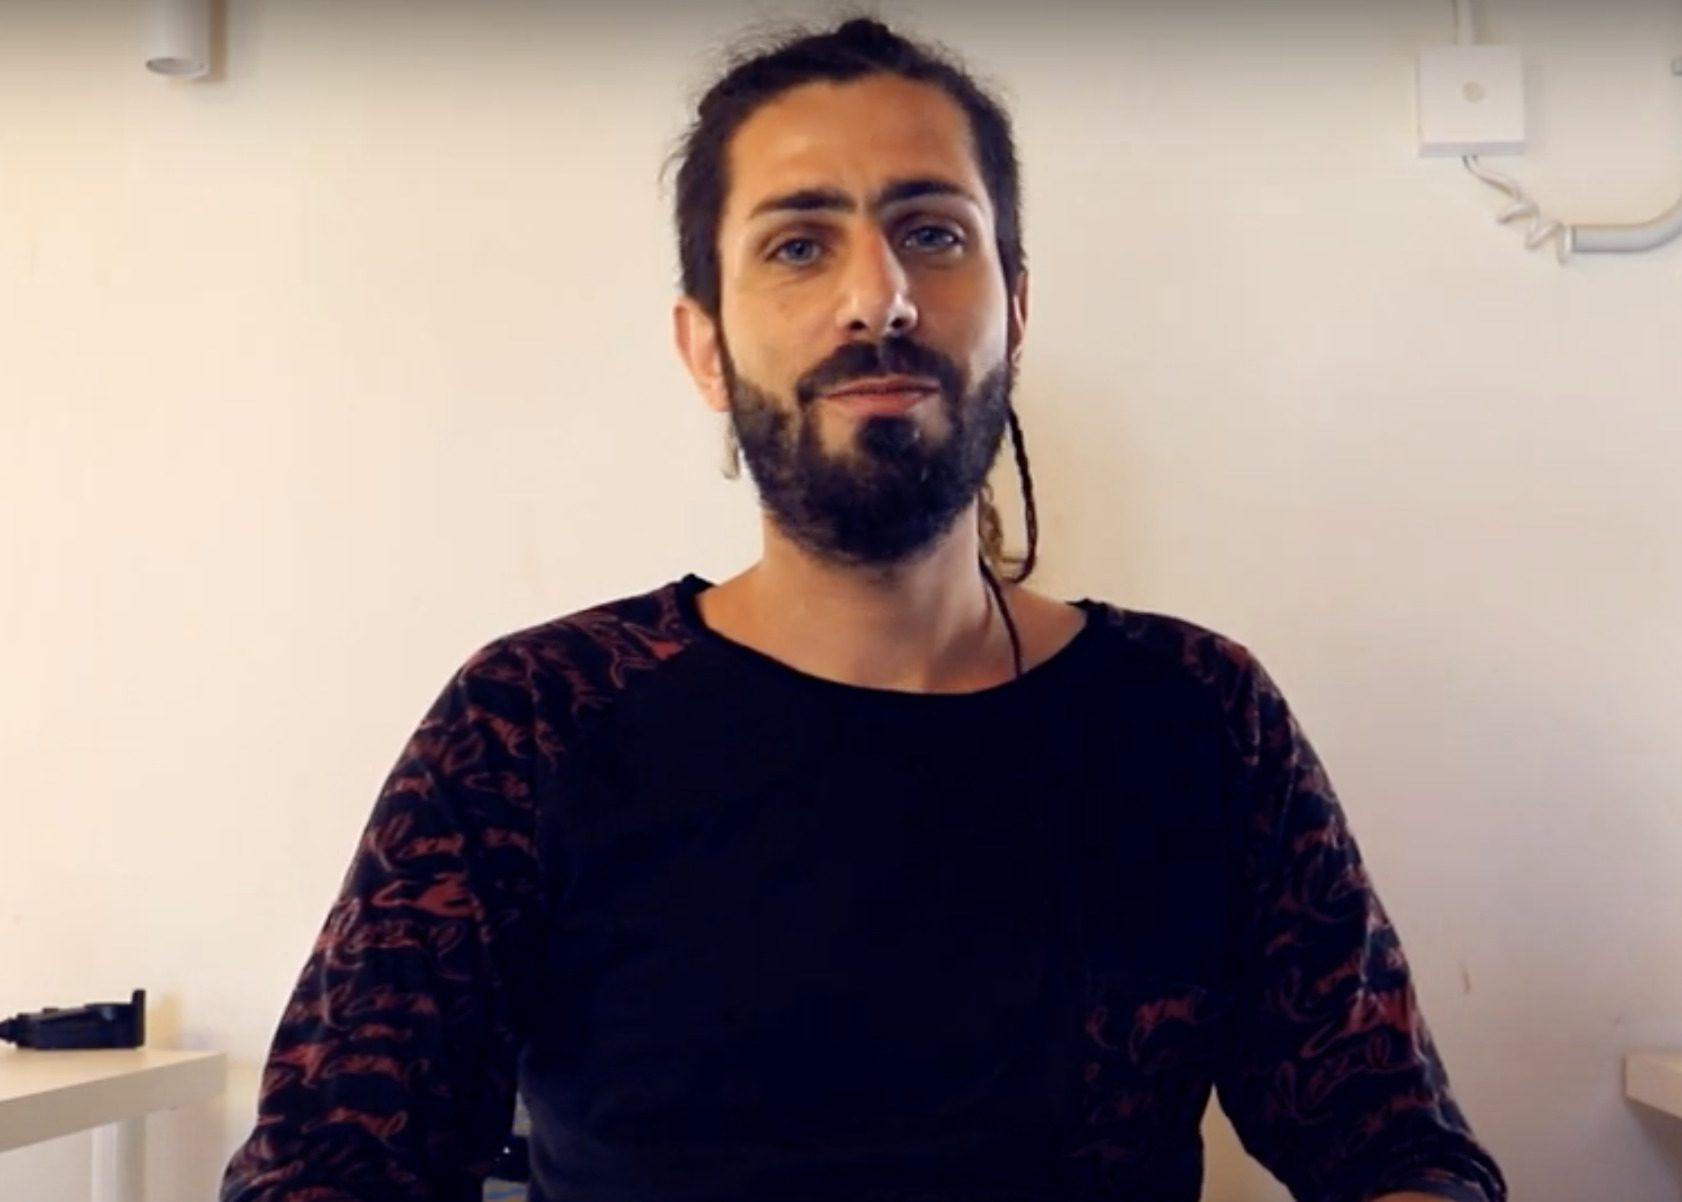 Peyman Babazadehn - Make-Up & Nails Course Participant